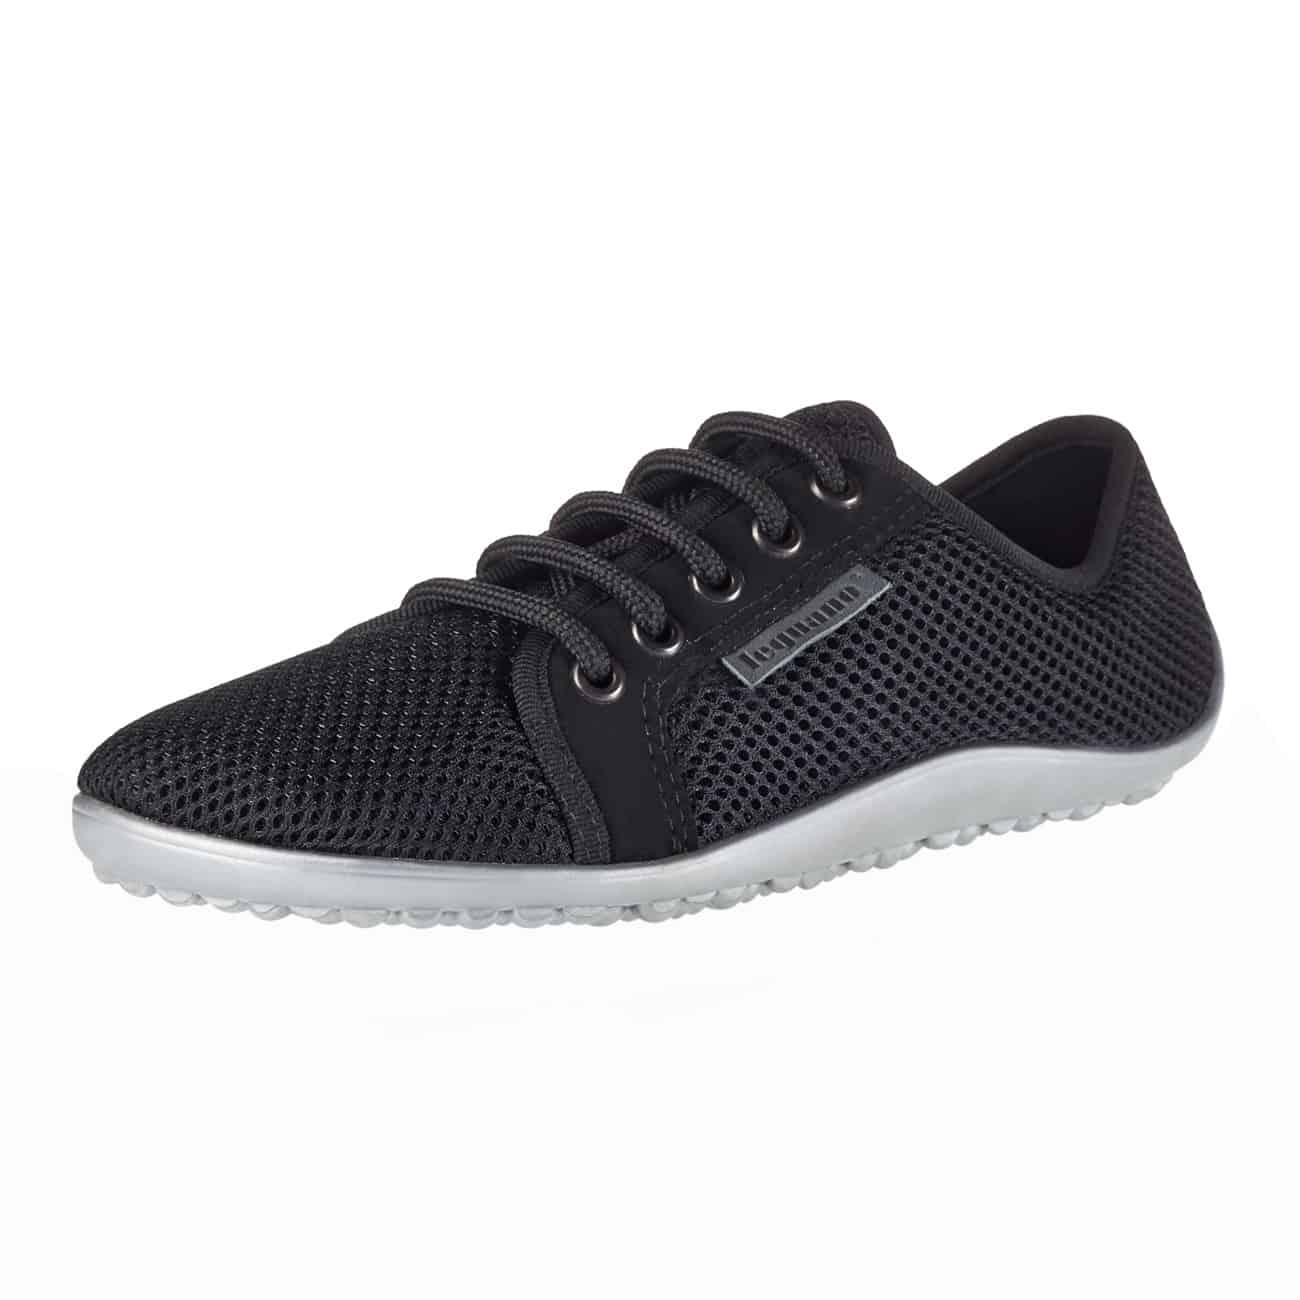 Leguano Black Sneakers